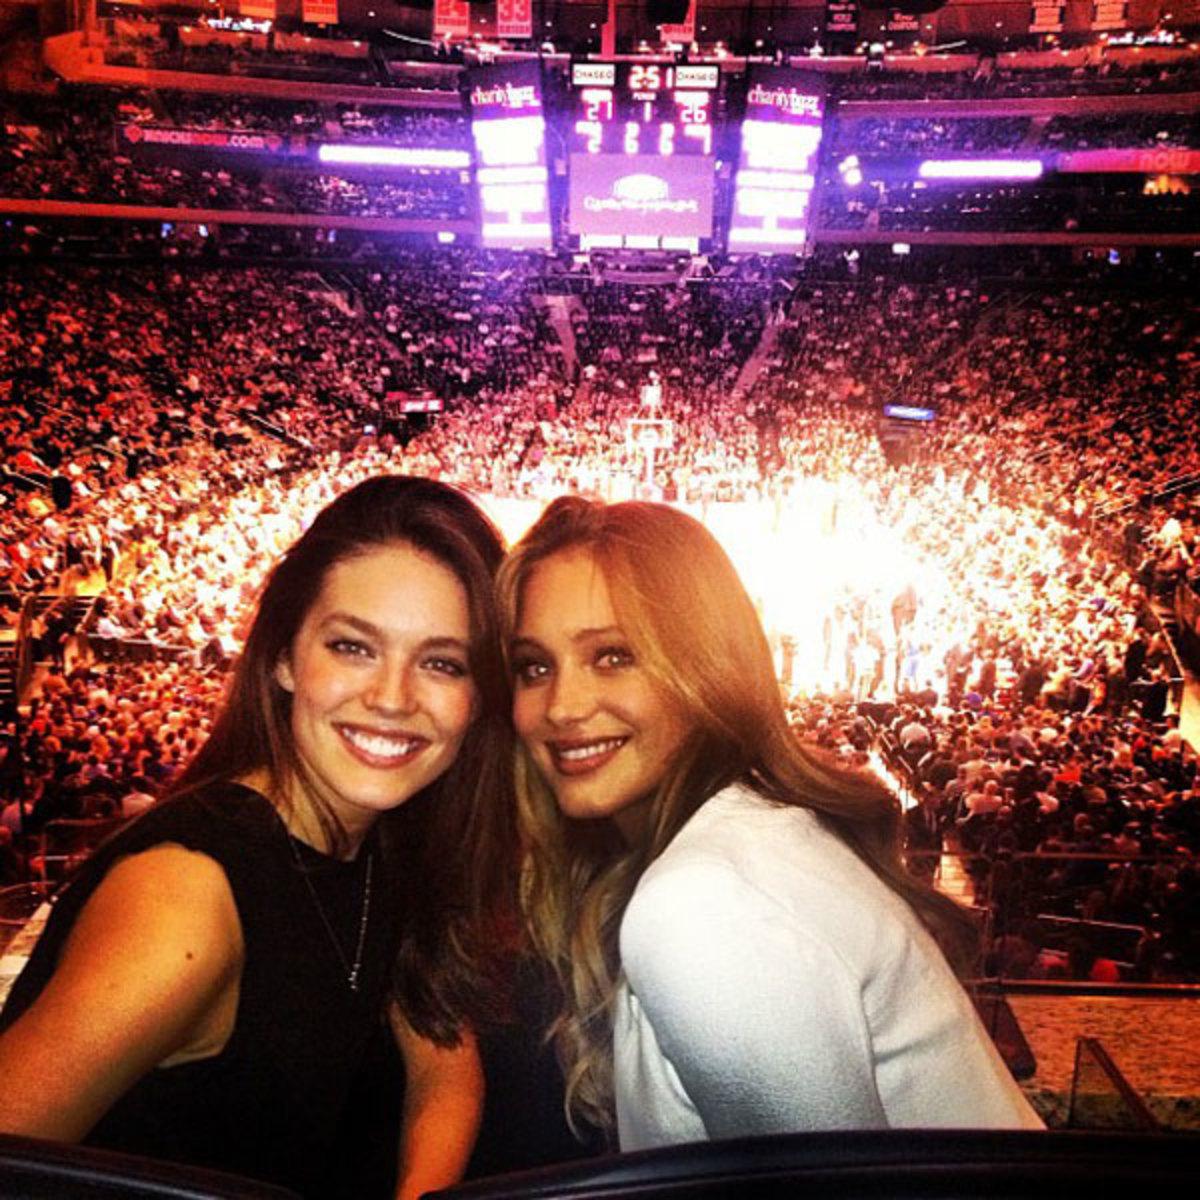 Emily DiDonato and Hannah Davis :: @emilydidonato1